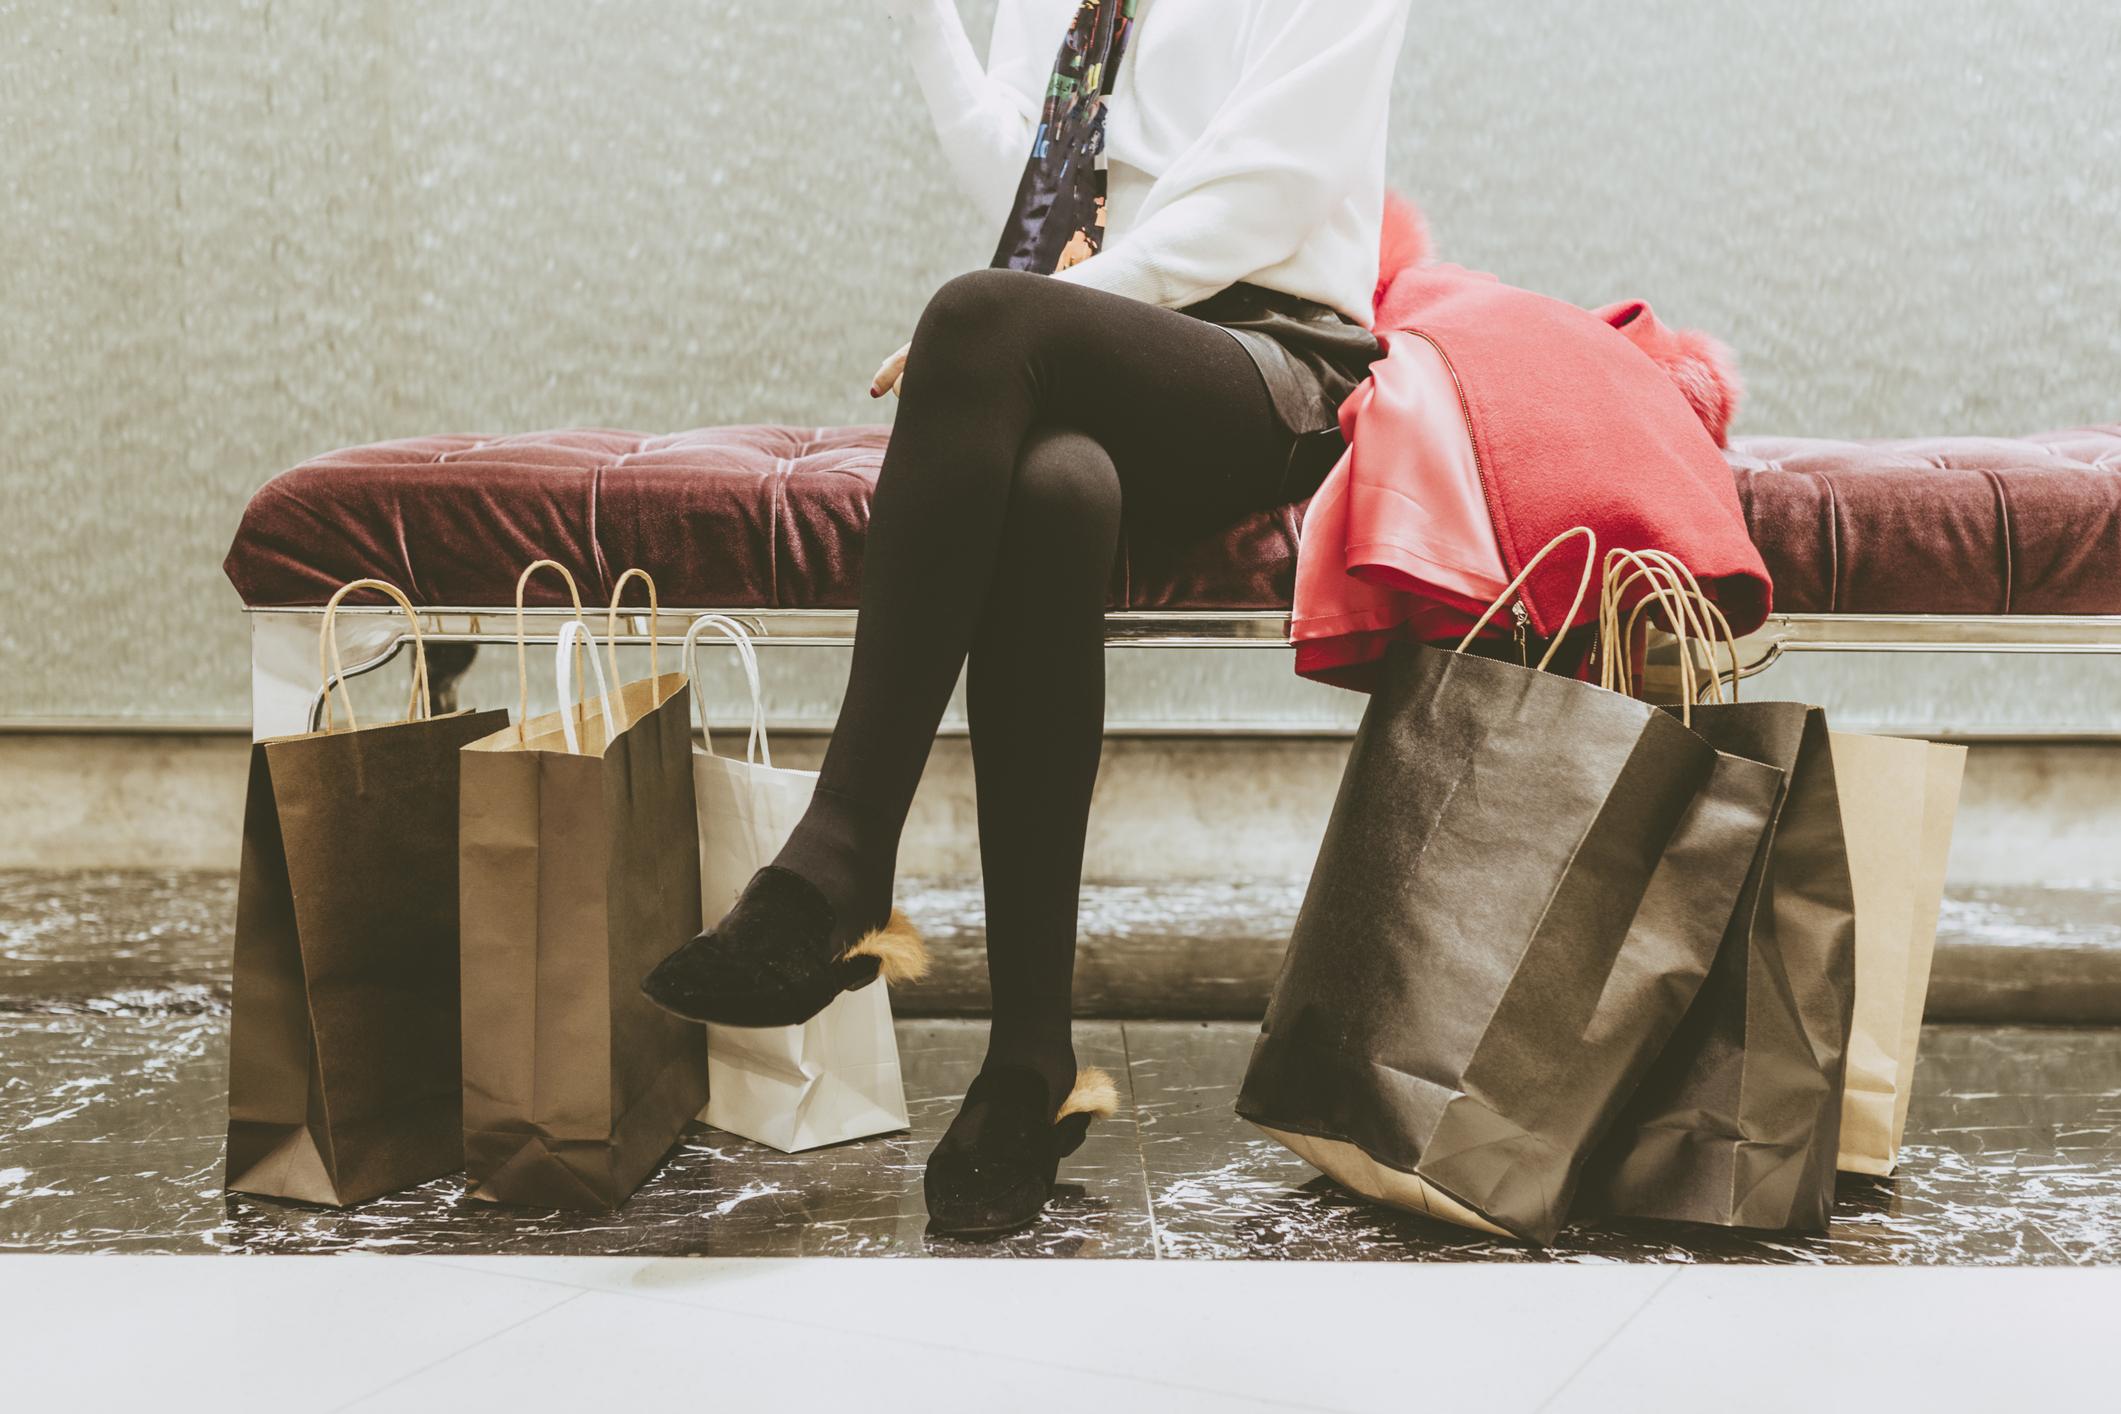 Shopping bags piled at a woman's feet.